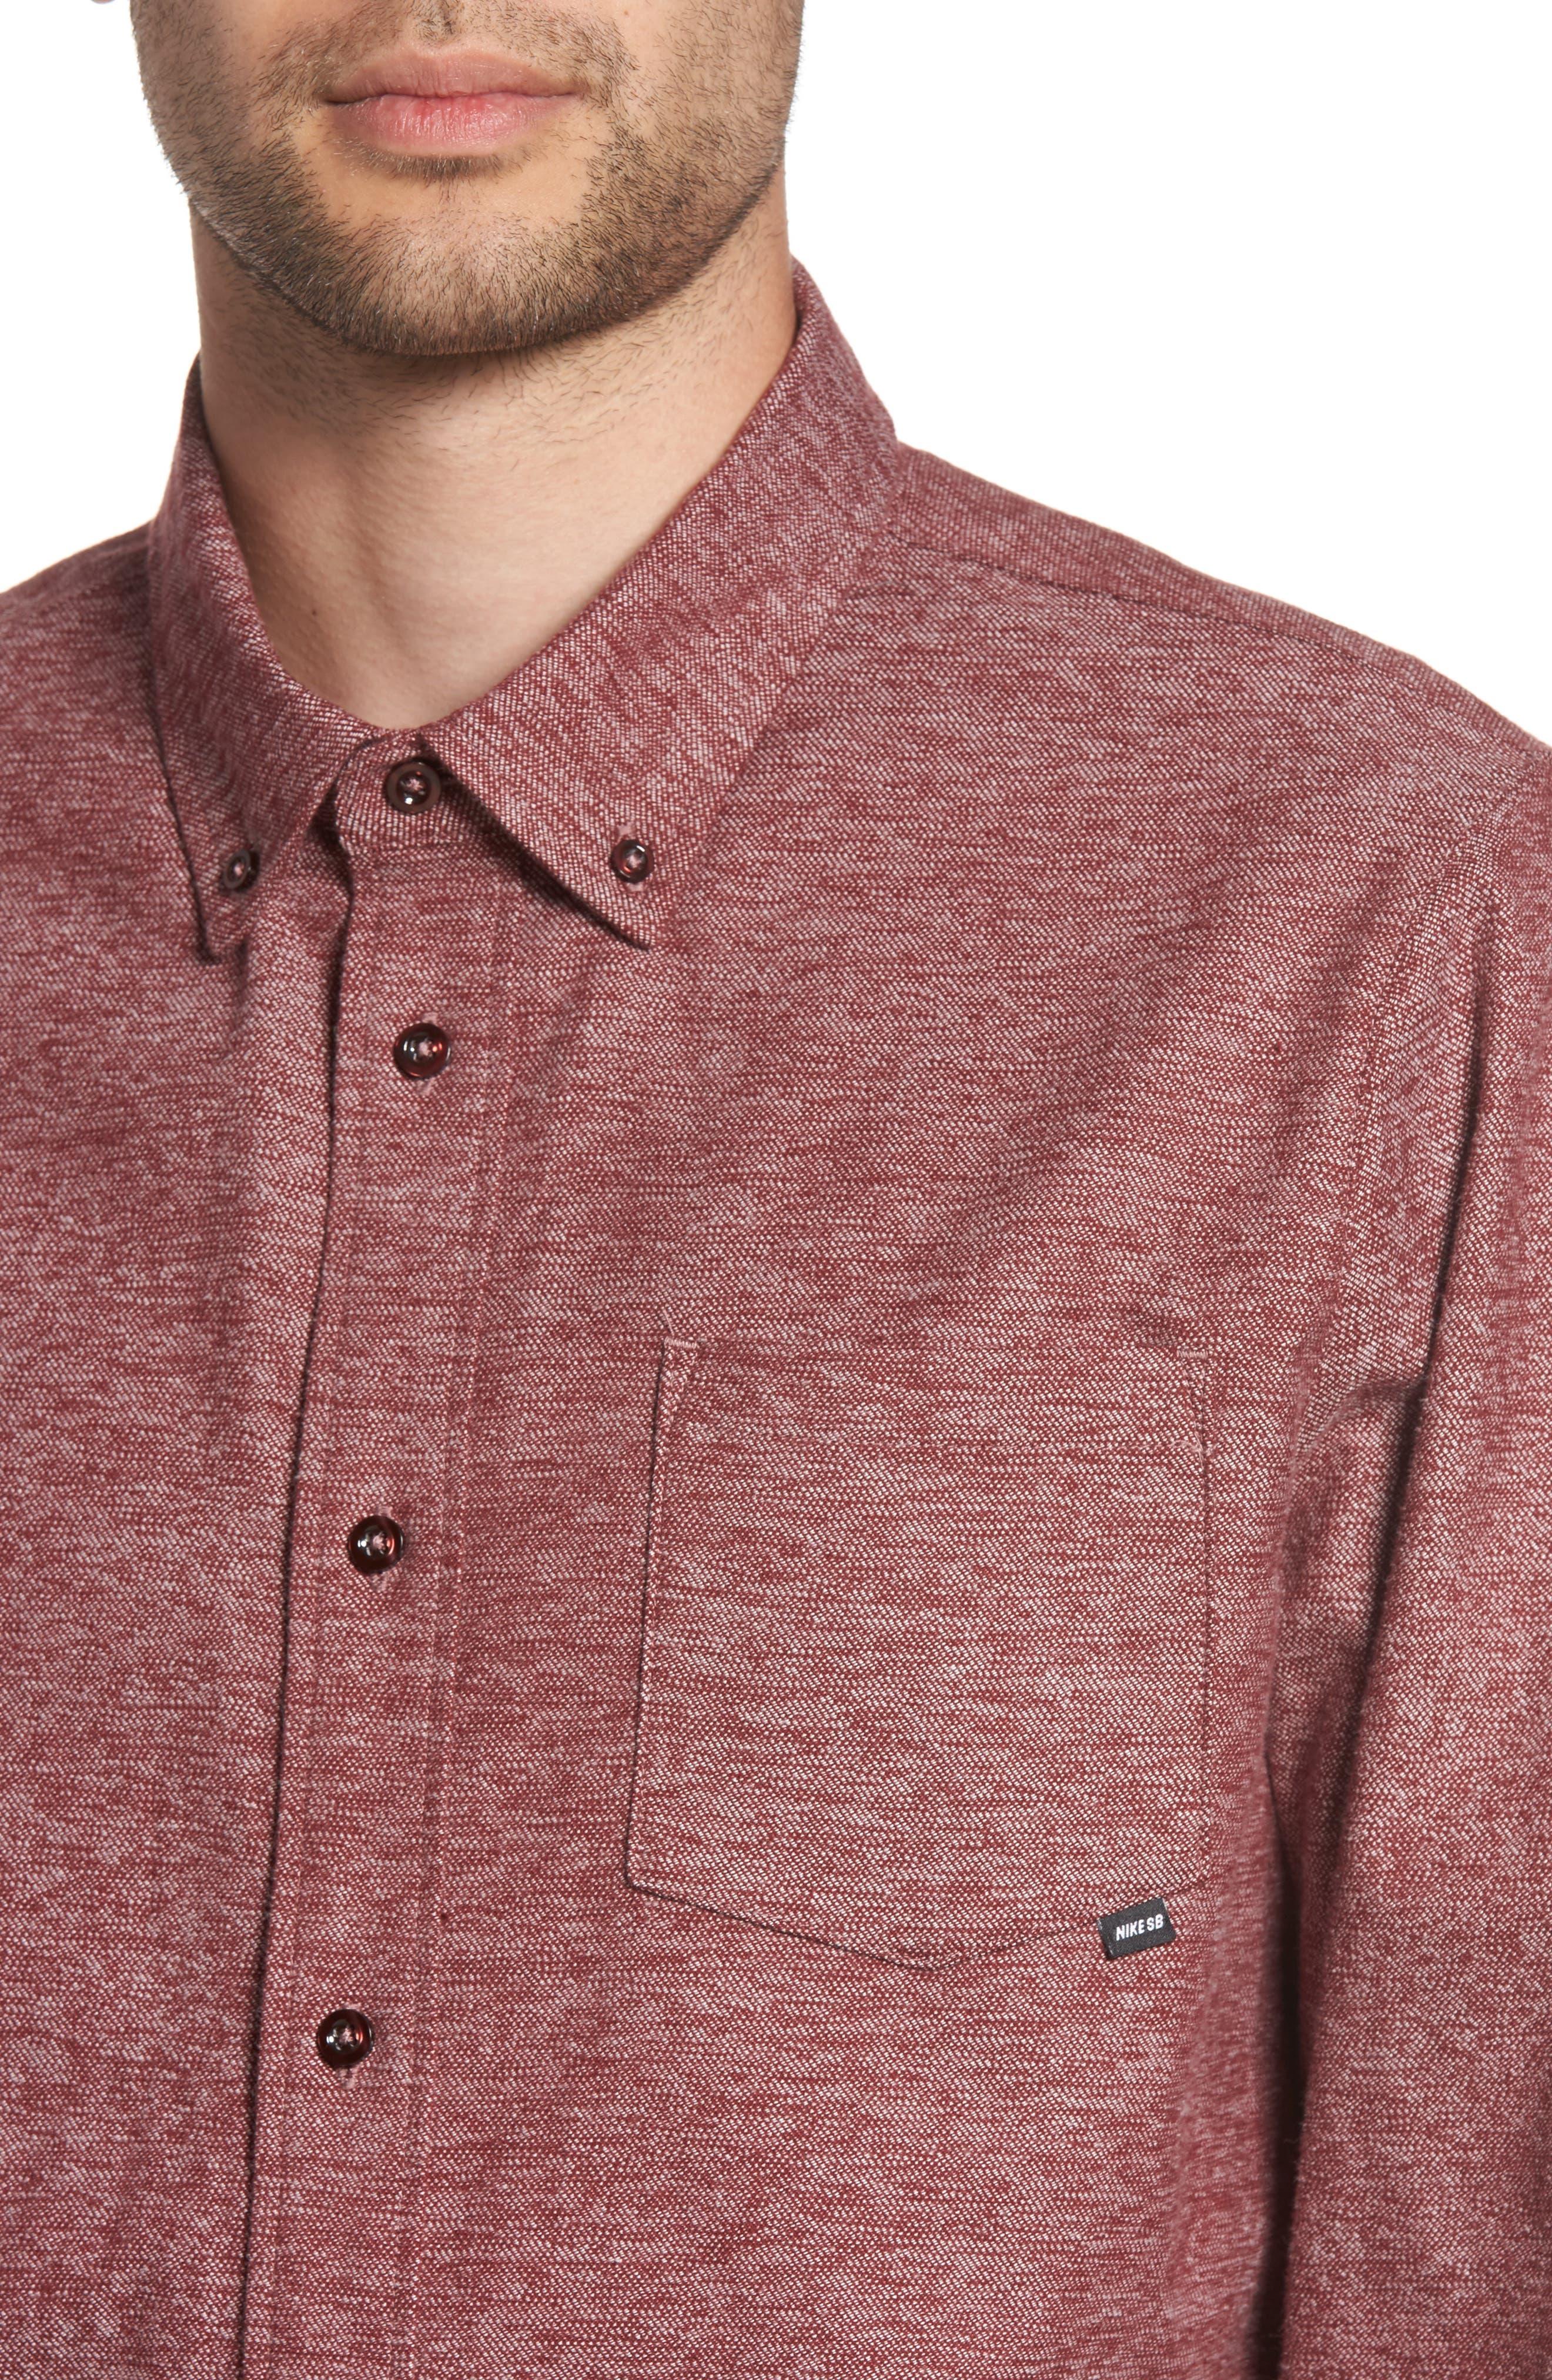 Holgate Flex Shirt,                             Alternate thumbnail 8, color,